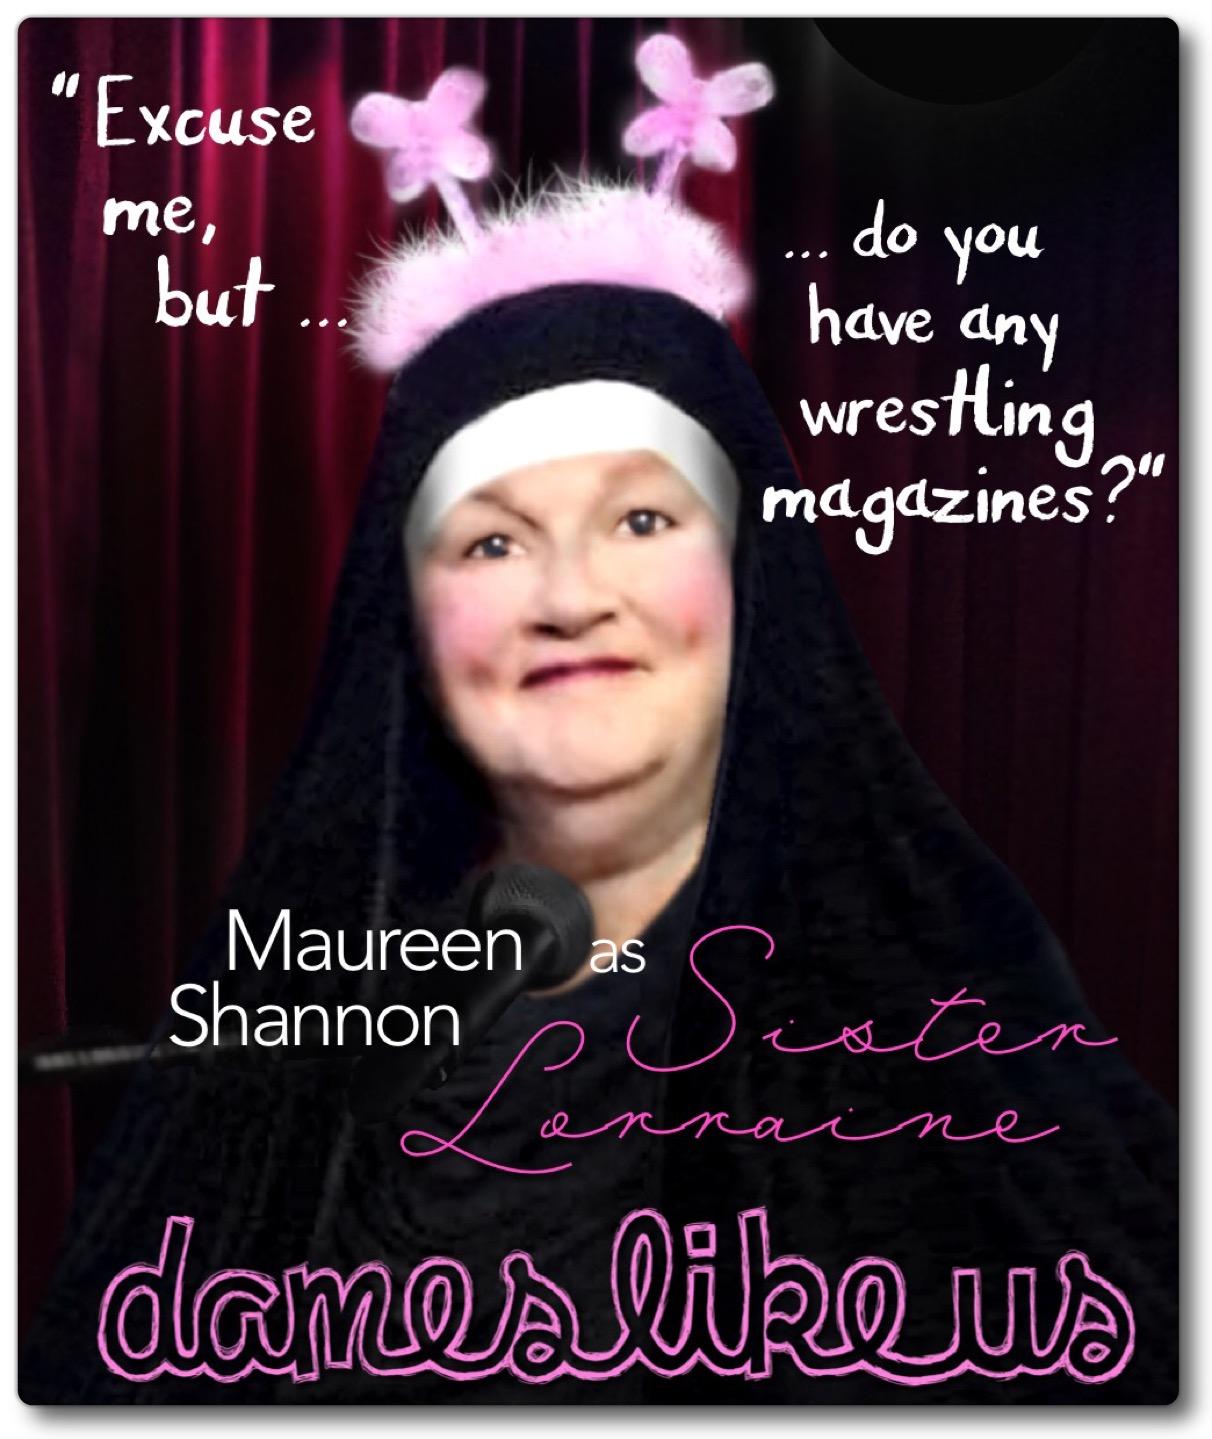 DAMES LIKE US - Sister Lorraine